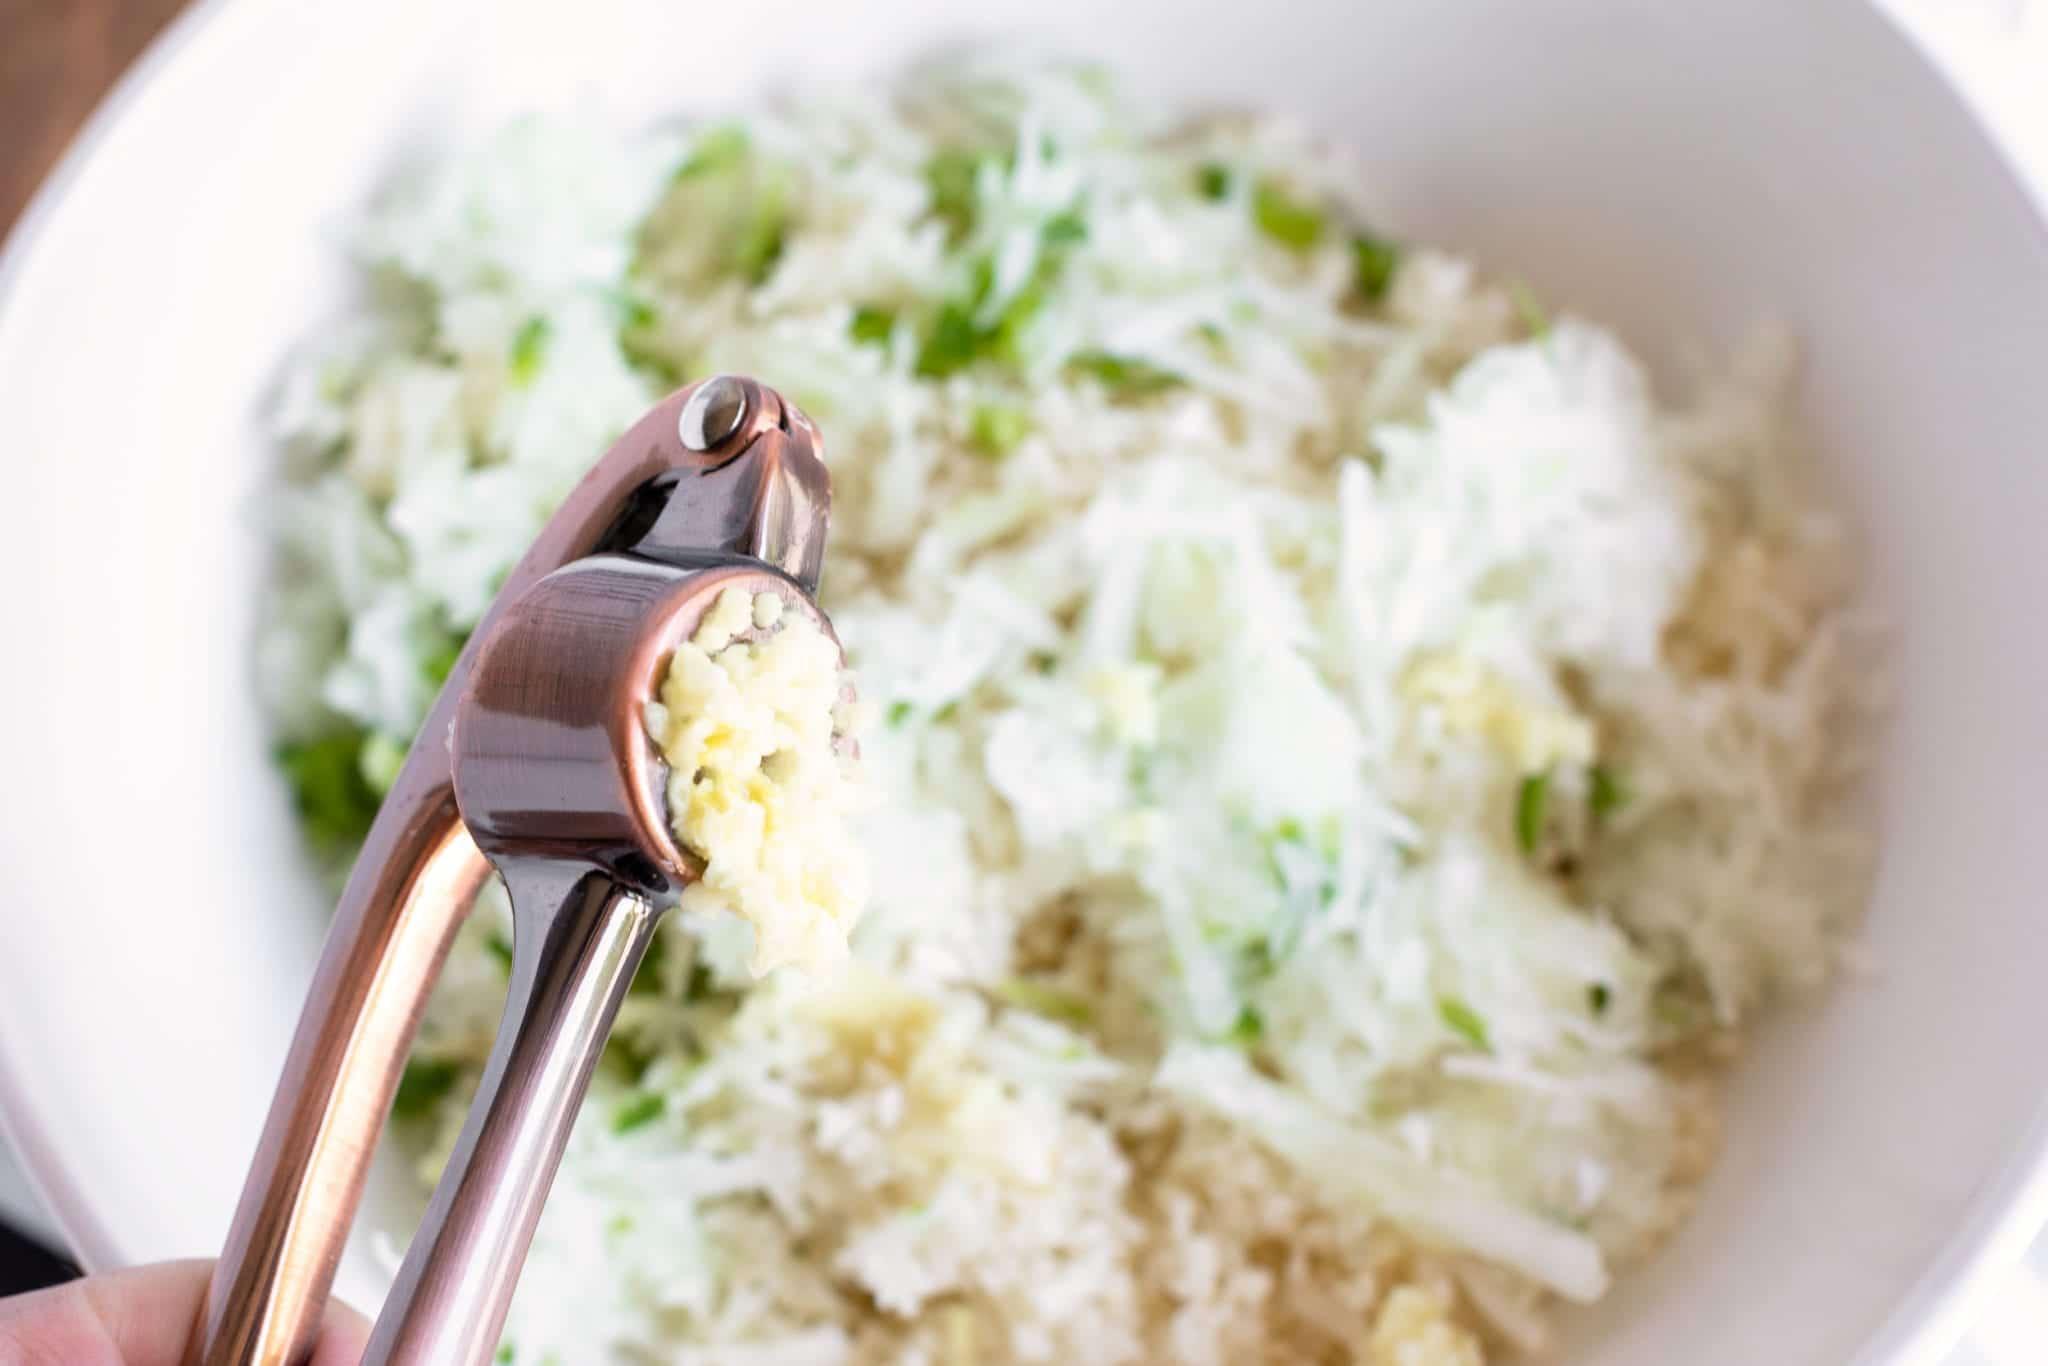 Zulay Kitchen Garlic press, pressing garlic clove for crispy cauliflower hashbrown recipe